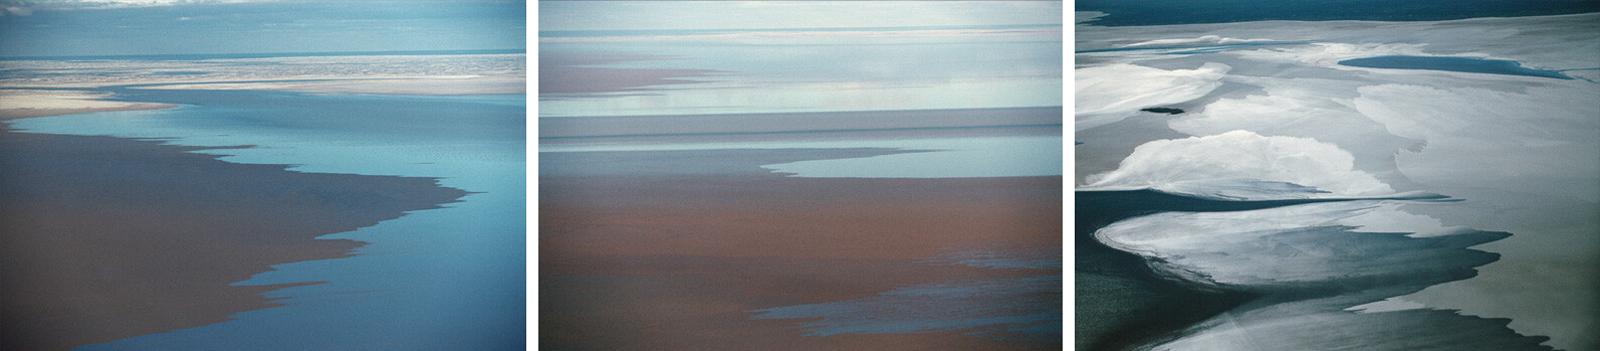 Artwork Earth 16 - Klaus D. Francke